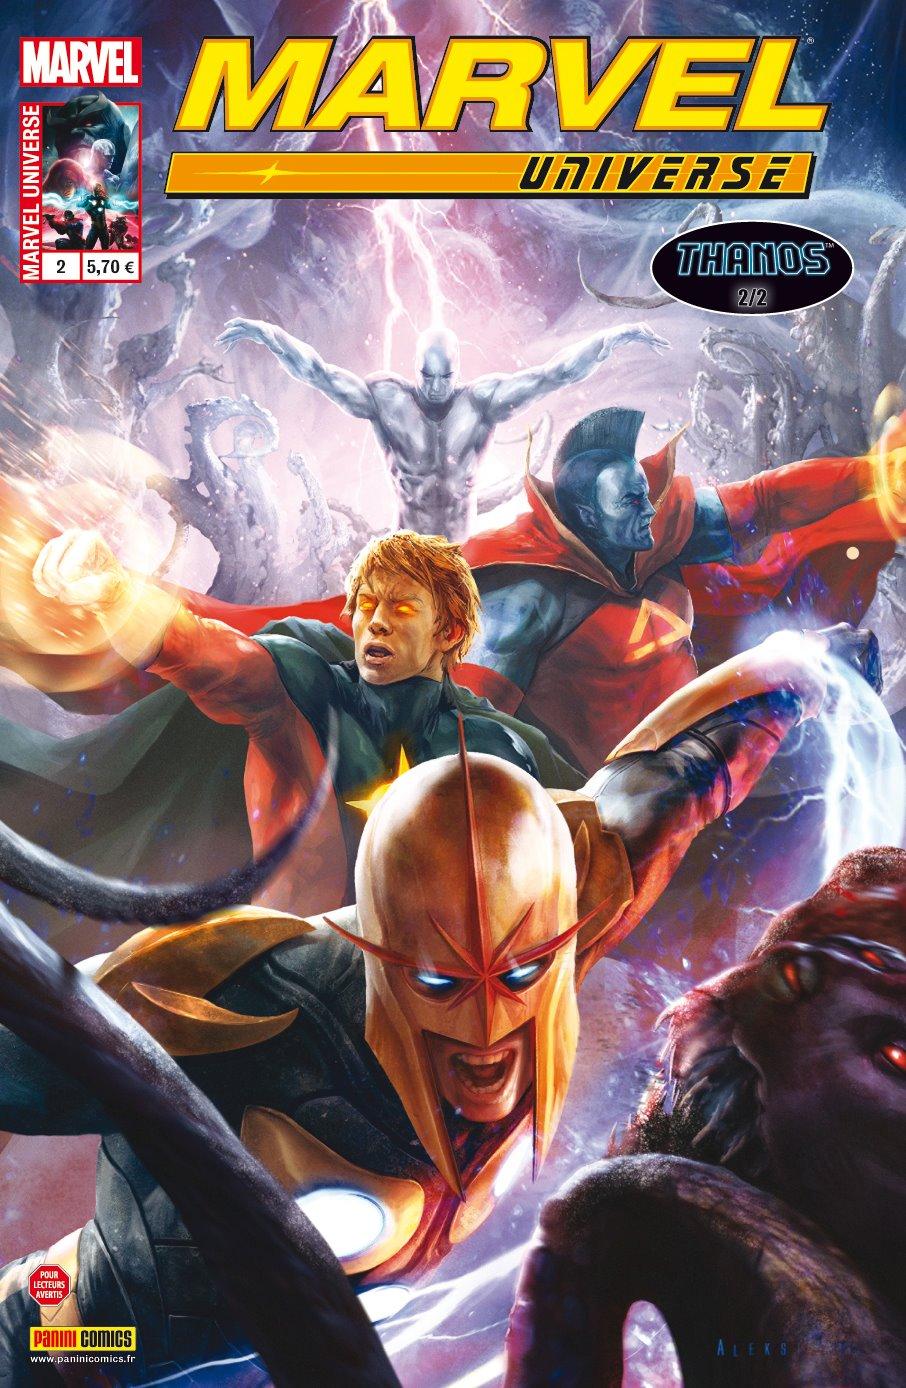 MARVEL UNIVERSE 2 : Thanos Imperative 2/2